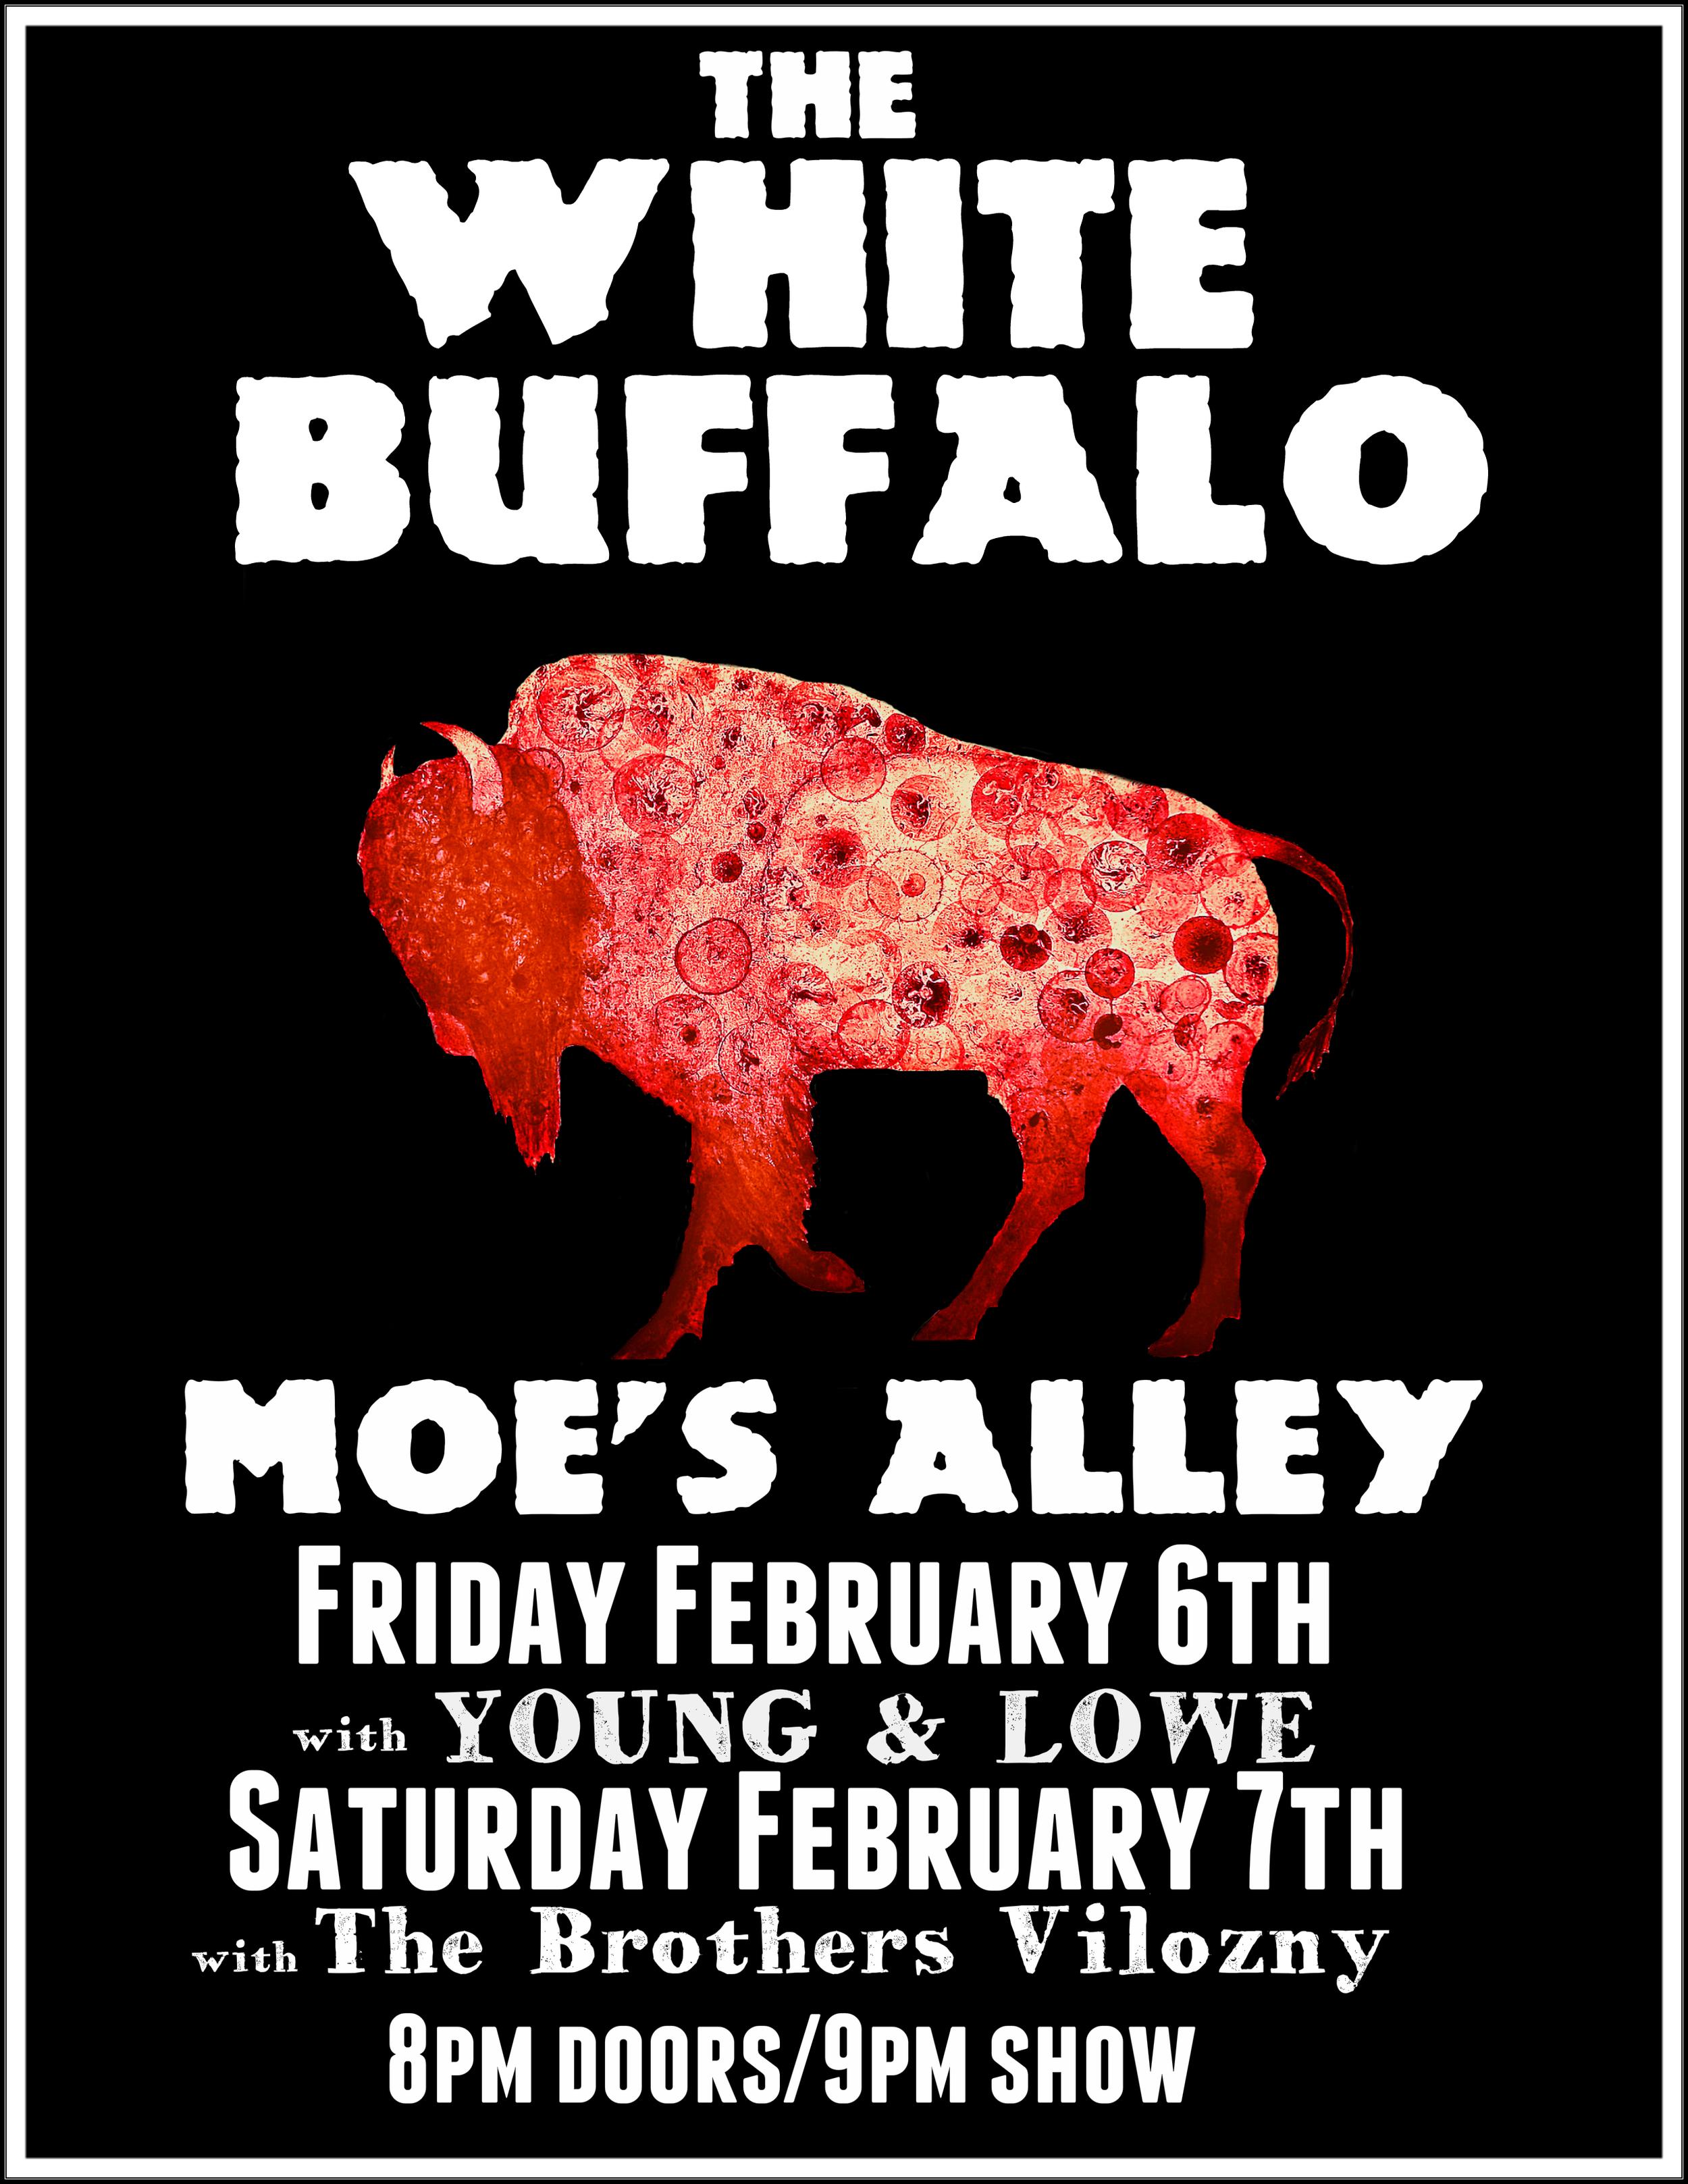 white buffalo 2-6-15.jpg